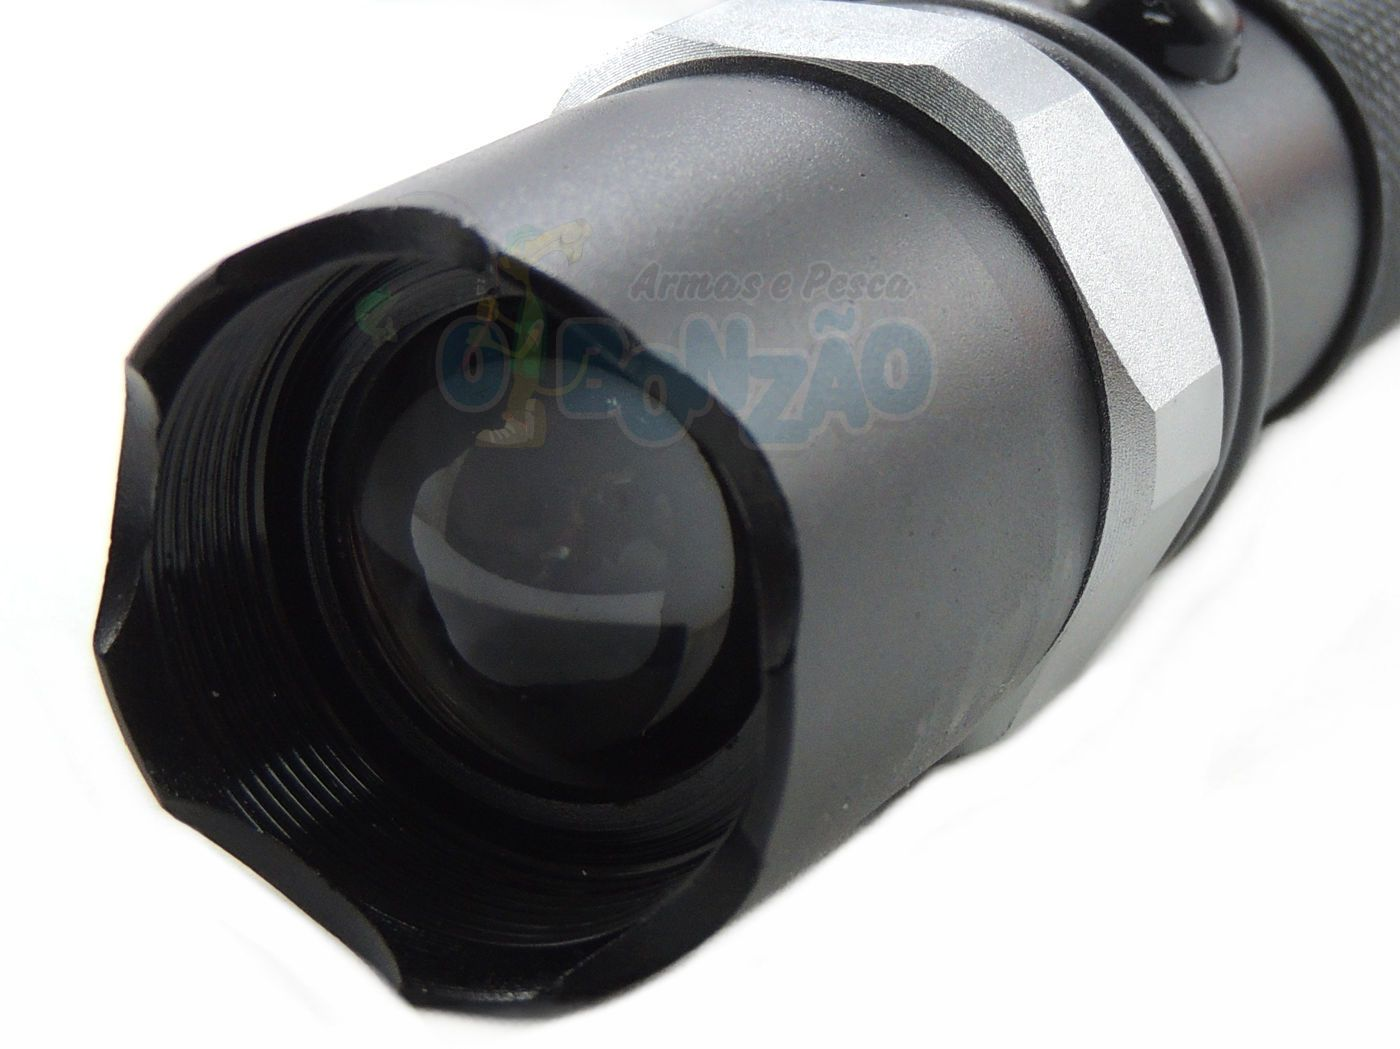 Lanterna Tática Led Swat Flashlight Multifunção 280000W